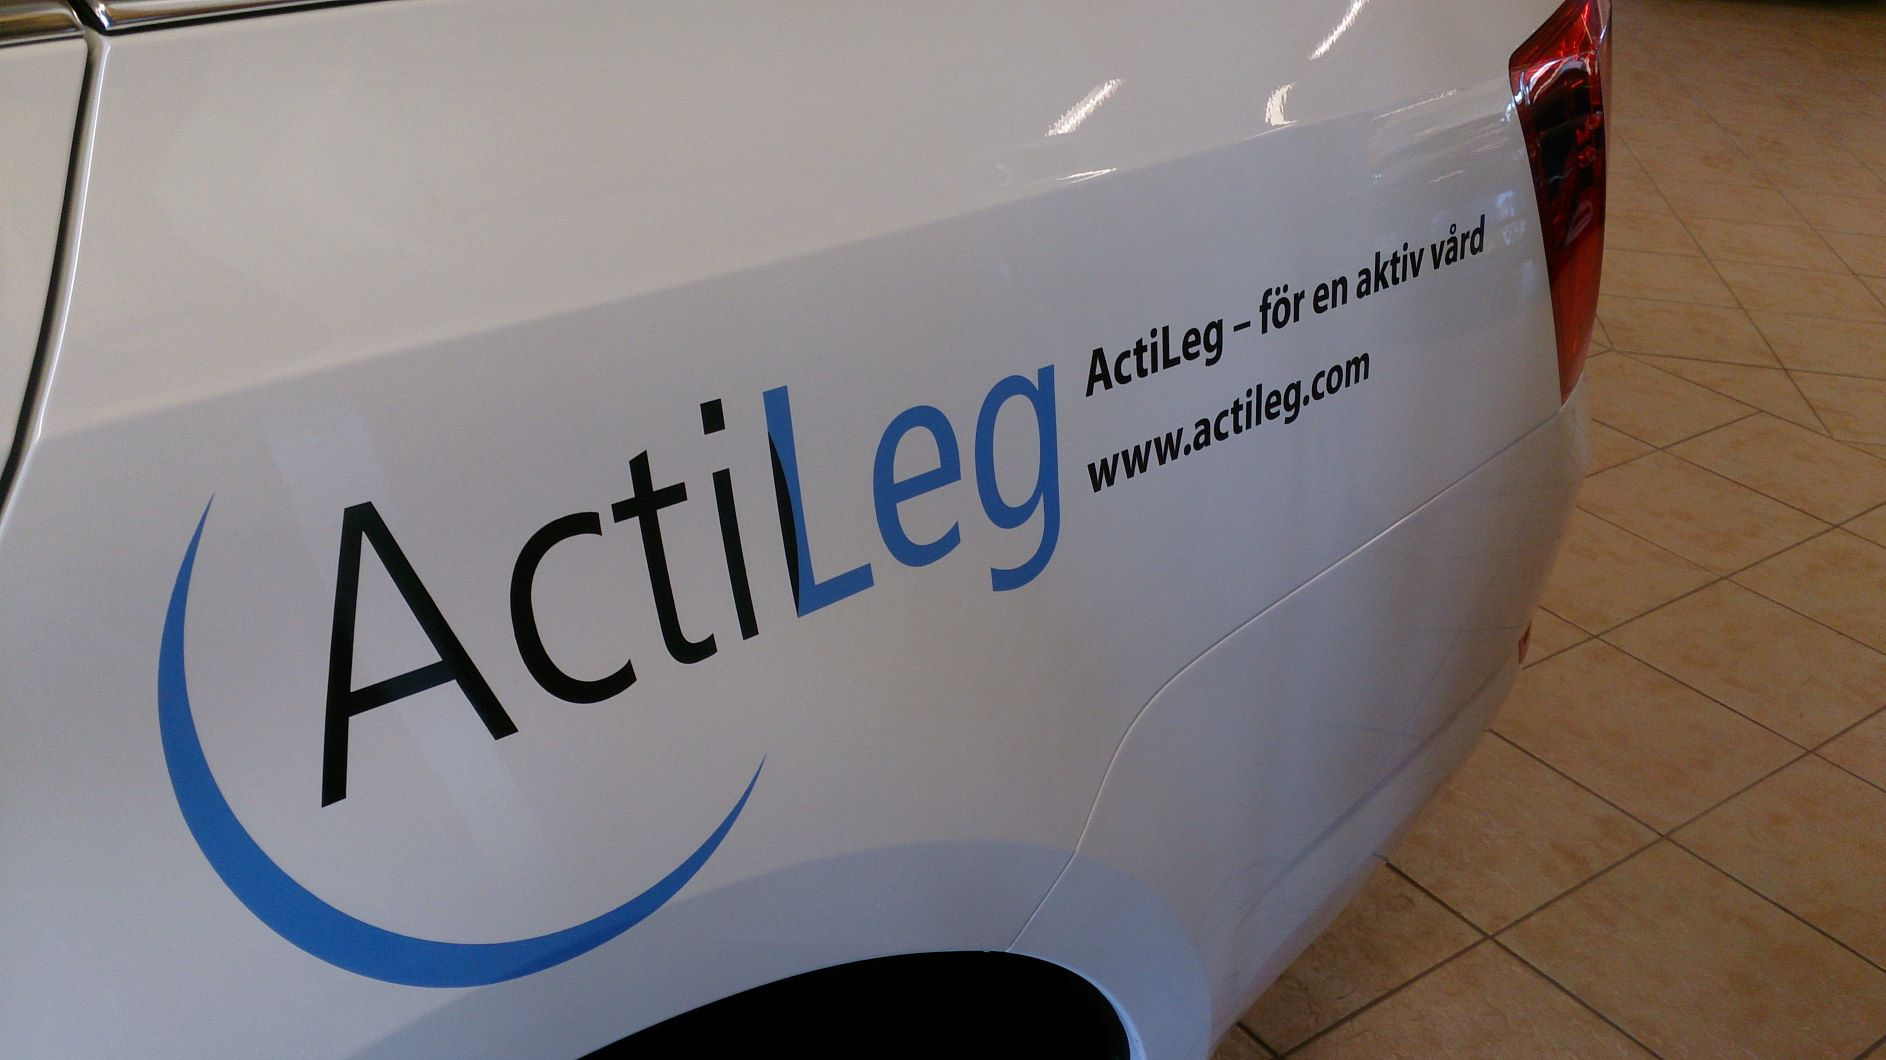 ActiLegs motto